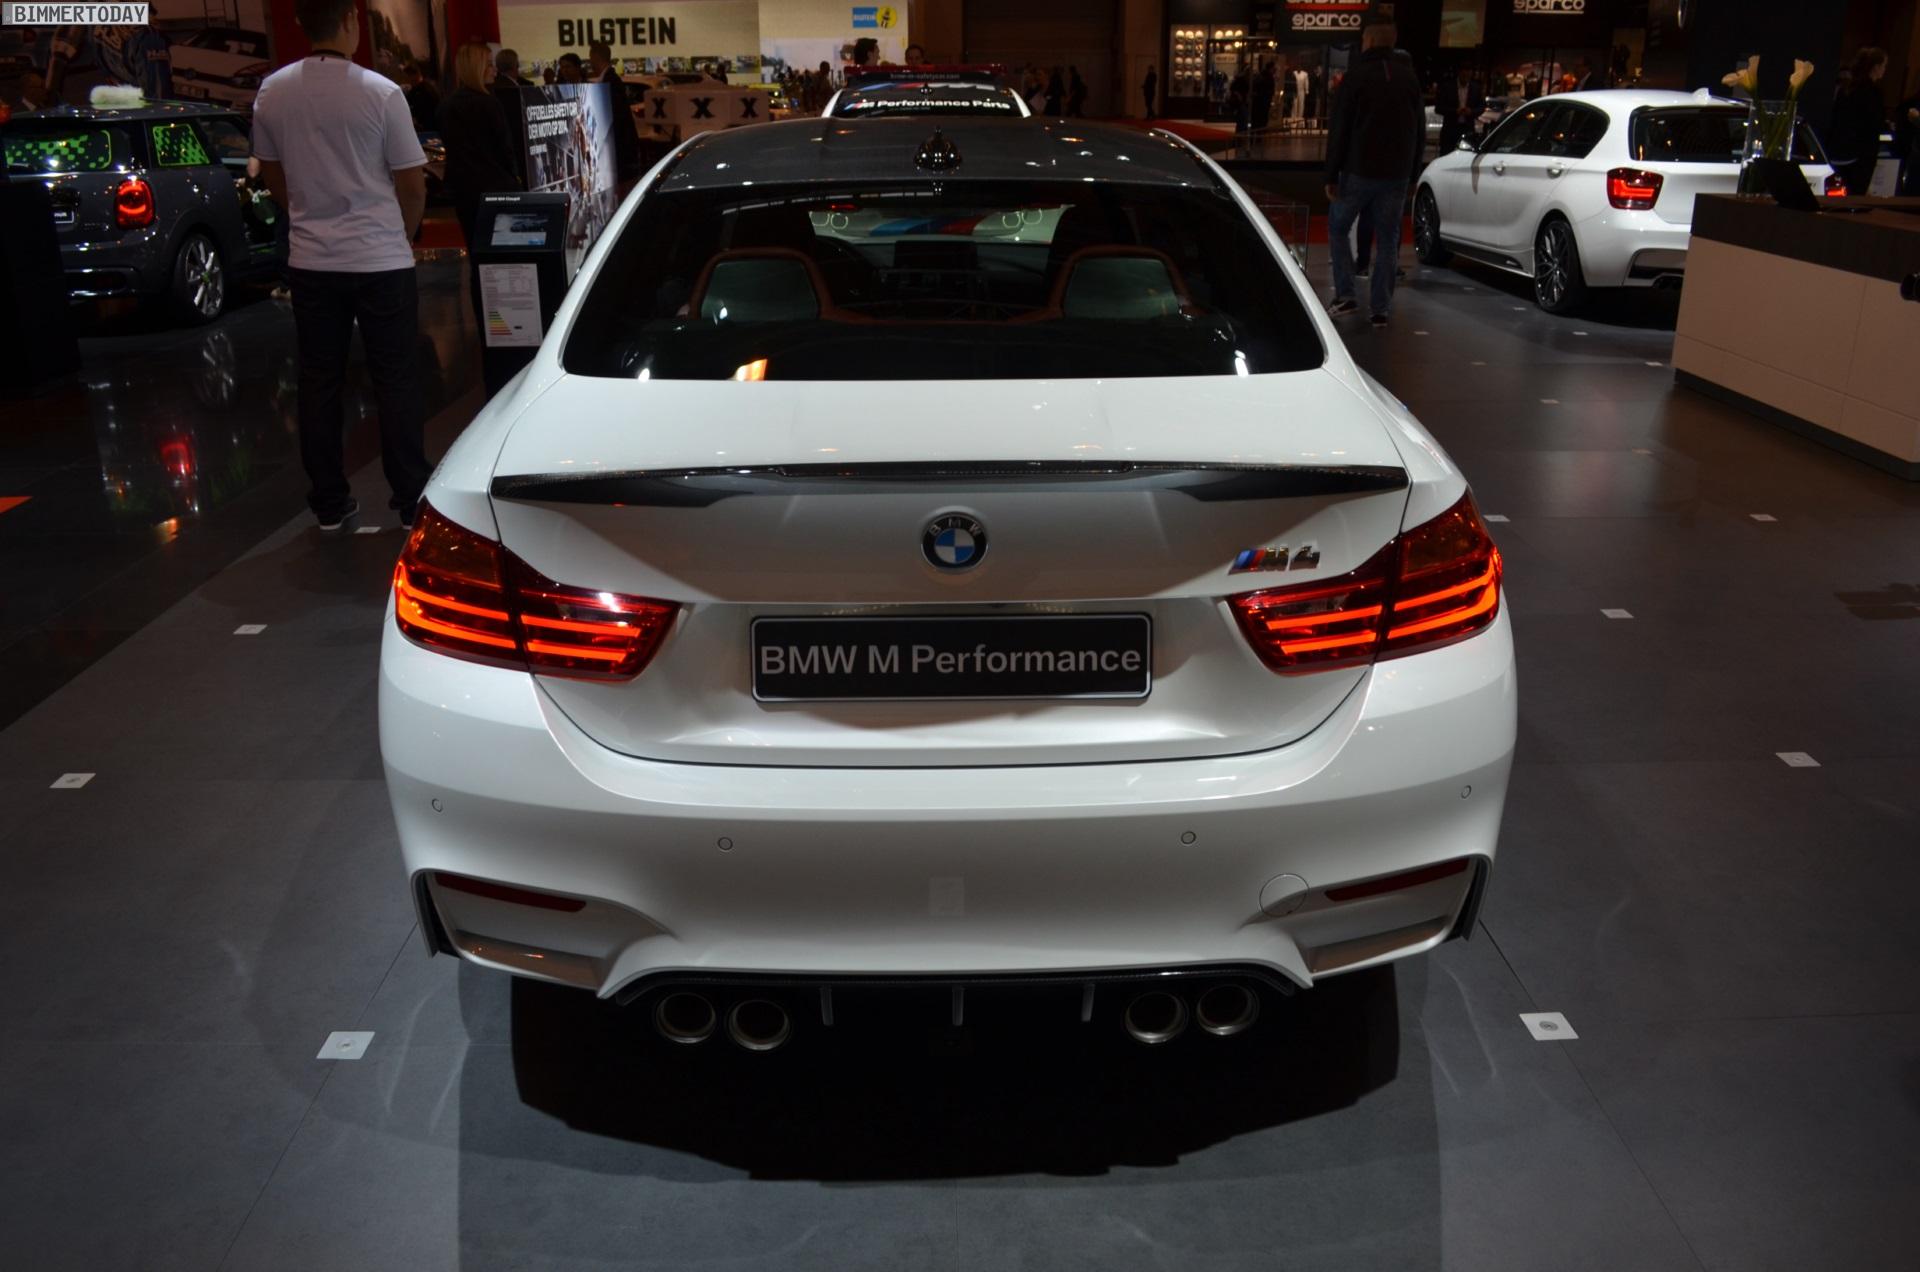 BMW M Performance BMW M4 Coupe F82 Essen Motor Show 2014 03